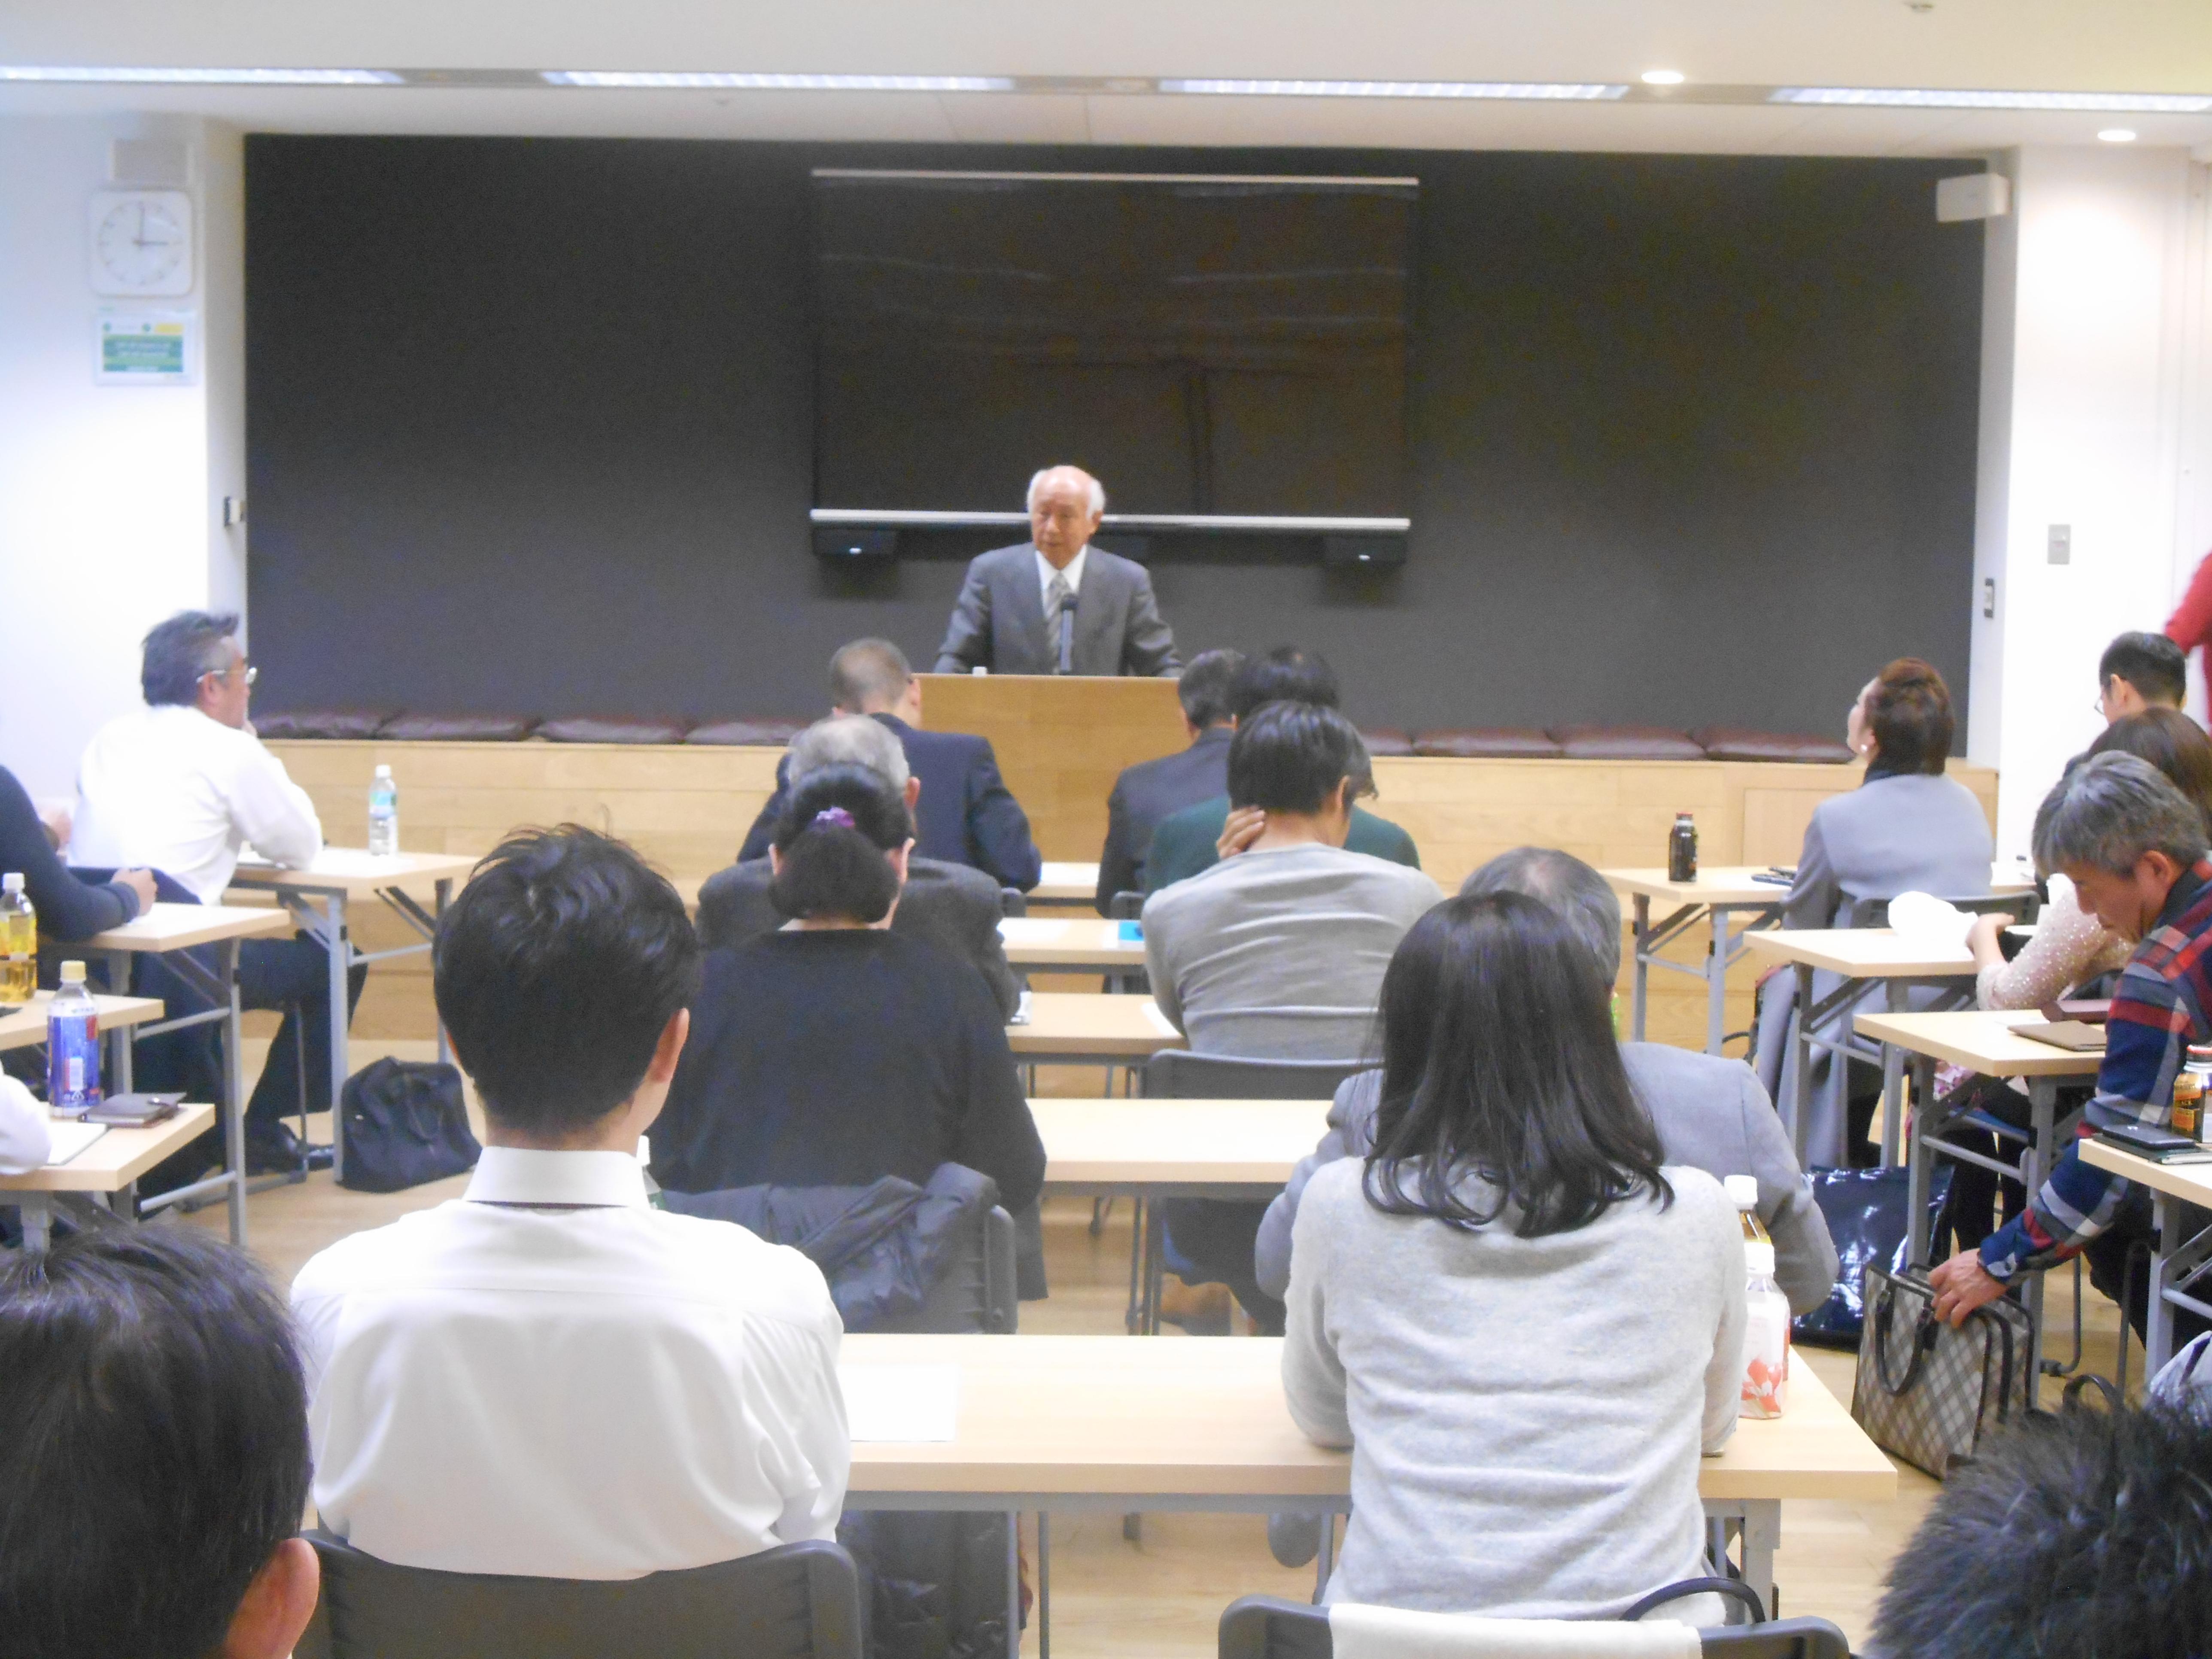 DSCN2287 - 4月1日東京思風塾の開催になります。